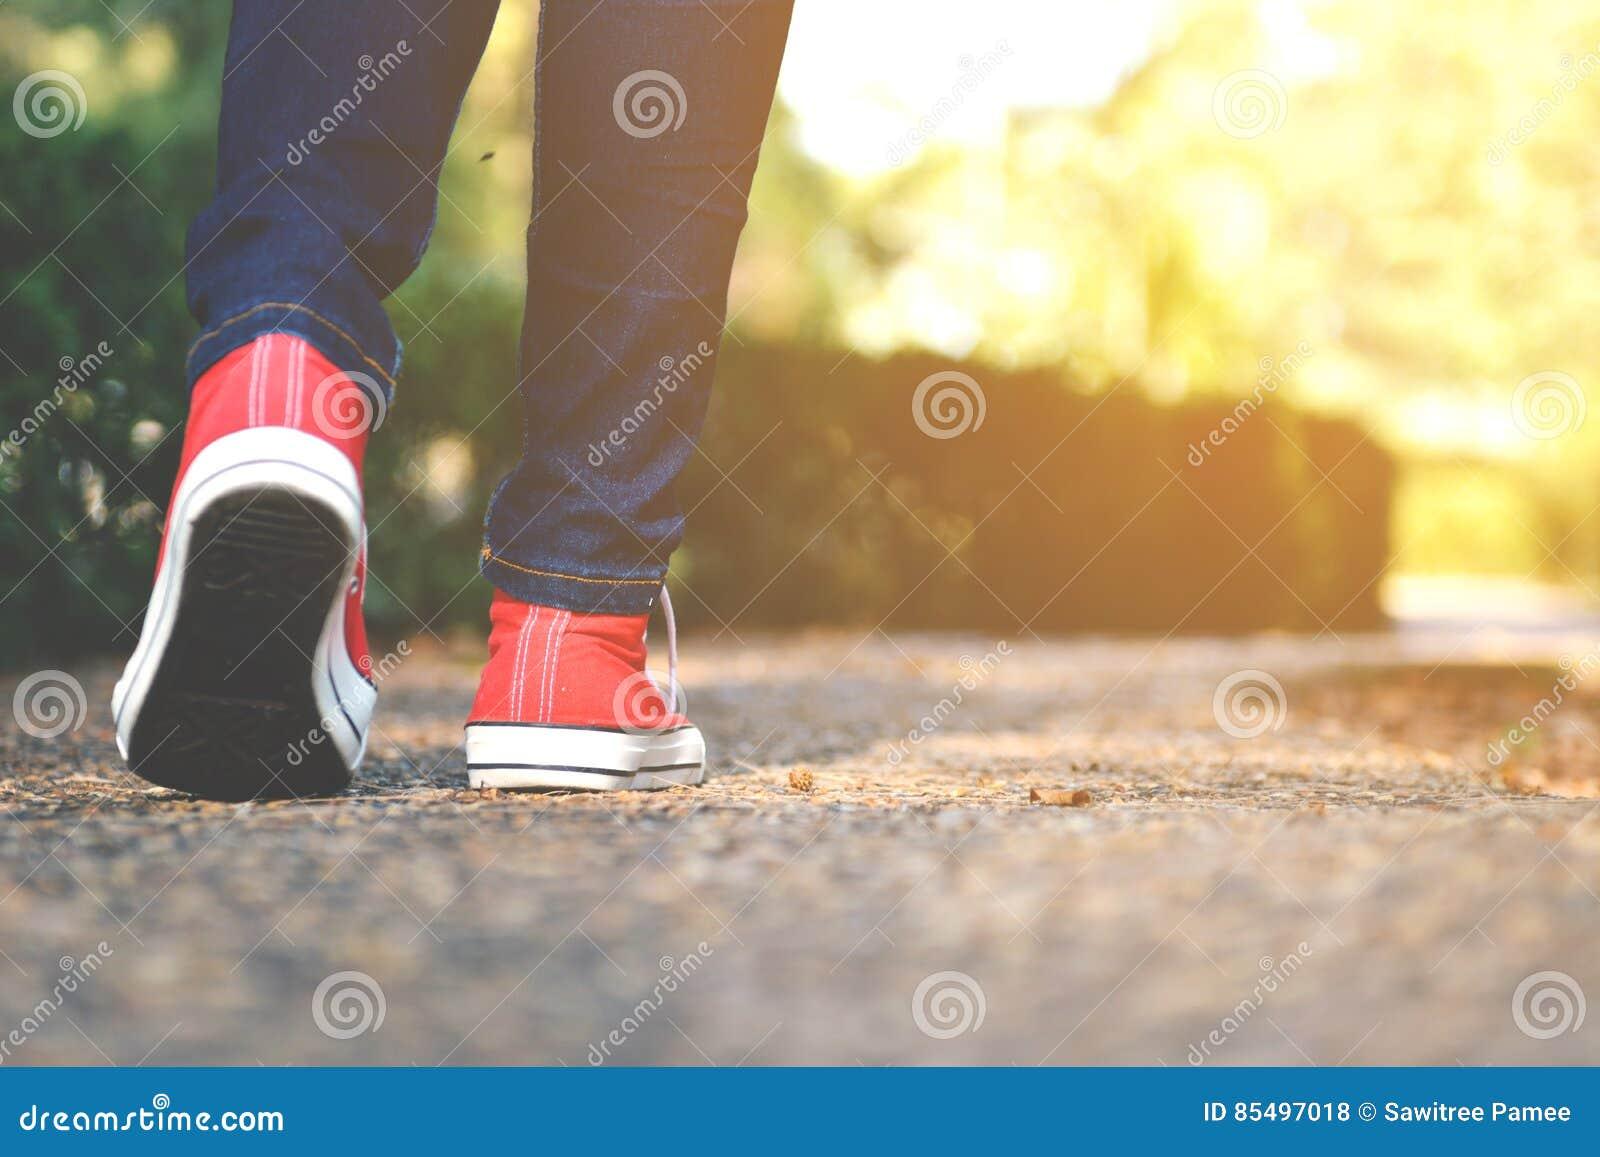 Feet women in the walking on the park